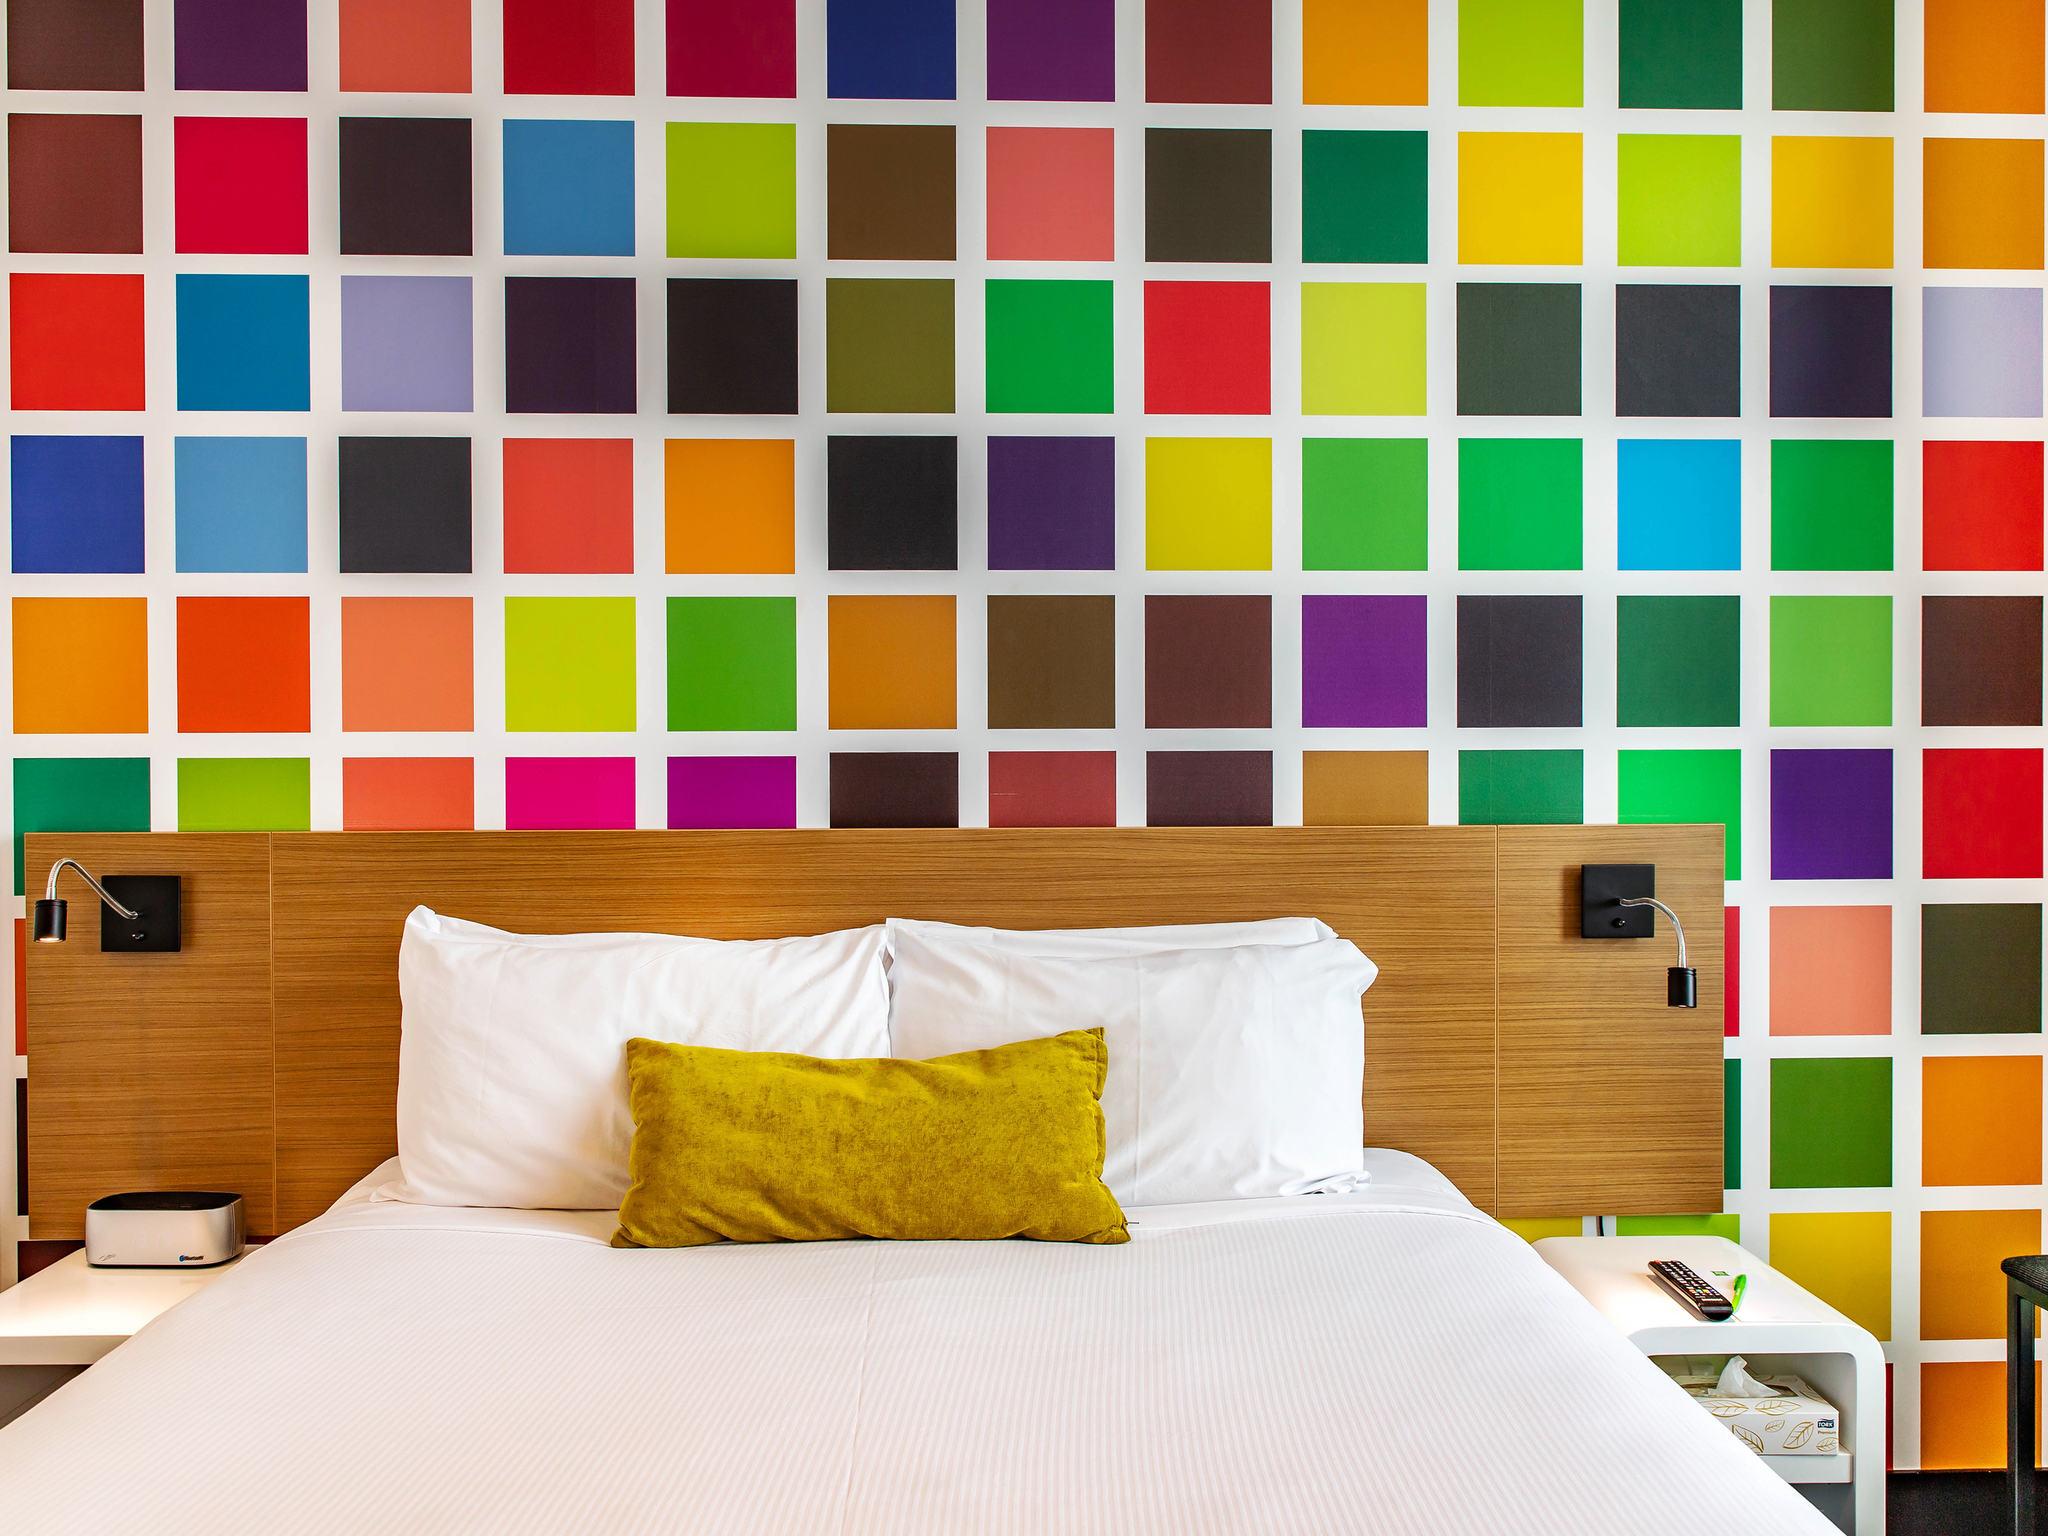 Hotel Ibis Styles Brisbane Elizabeth Street